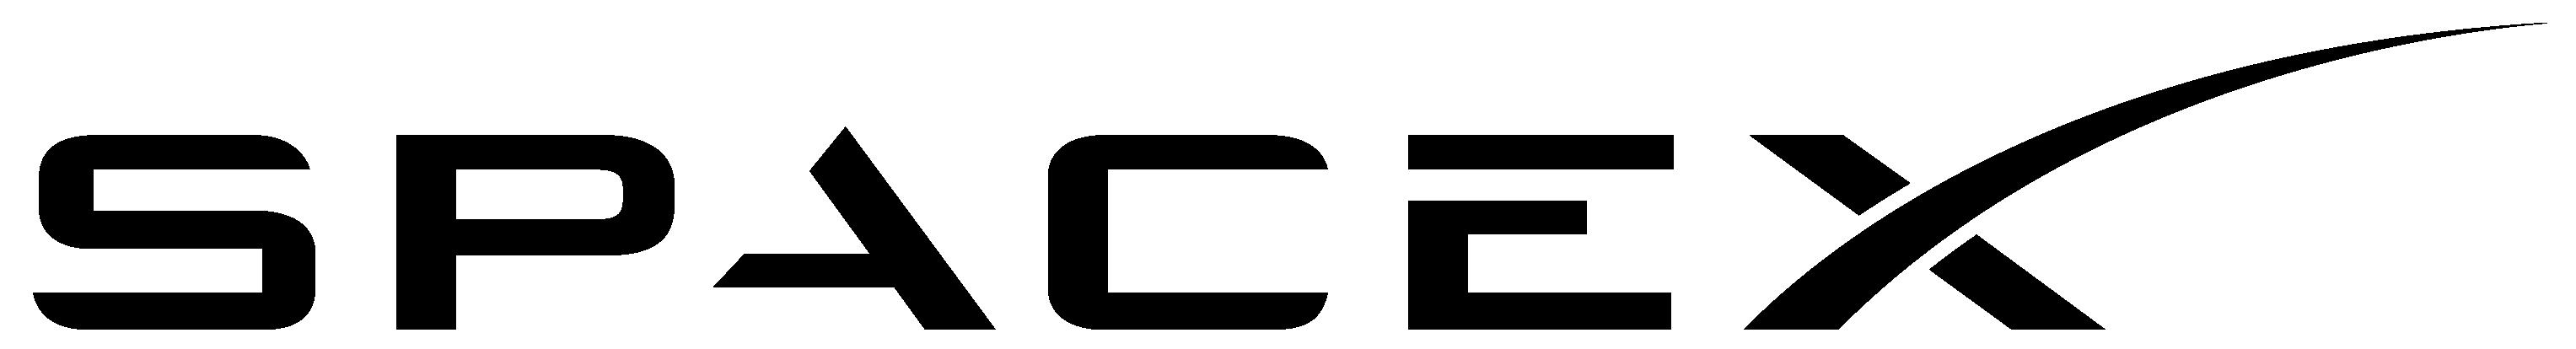 File:SpaceX Logo Black.png - Wikipedia